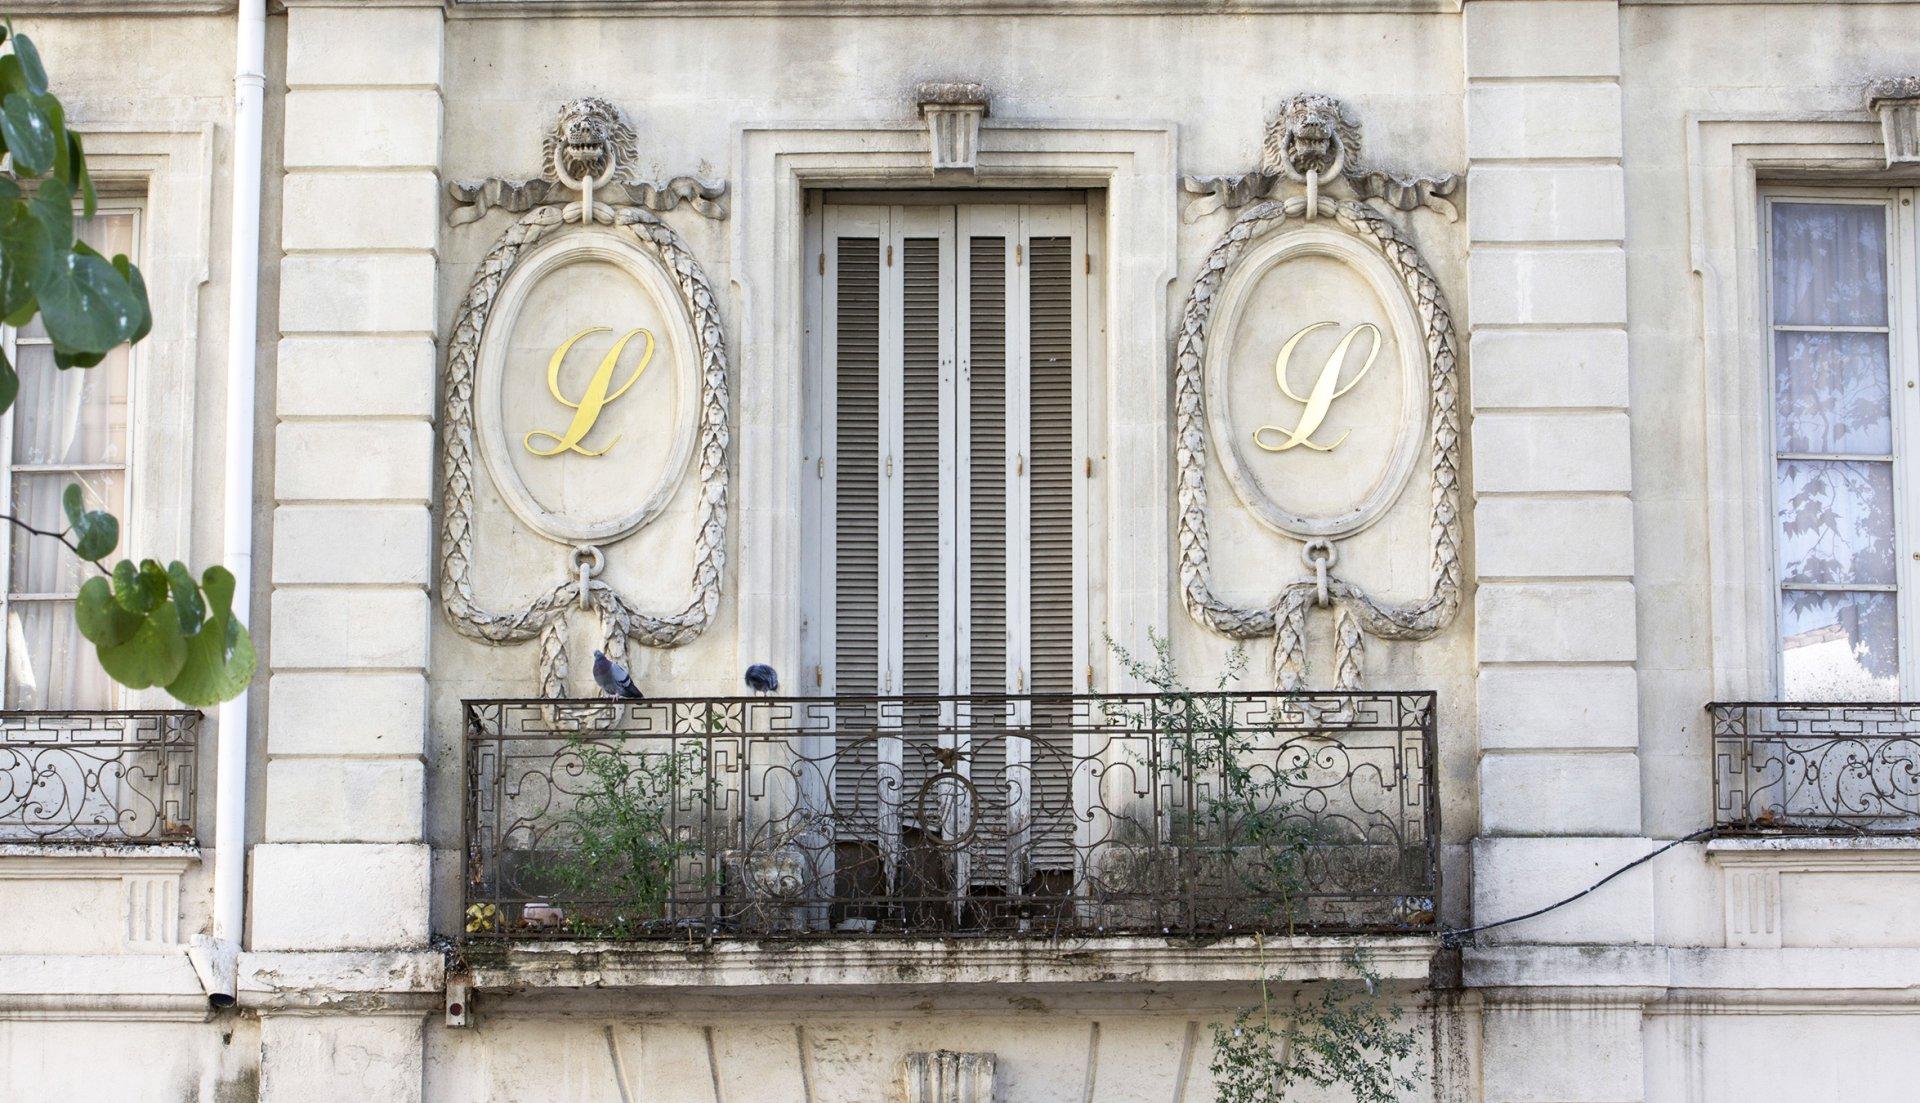 Vente Villa sur toit - Nîmes